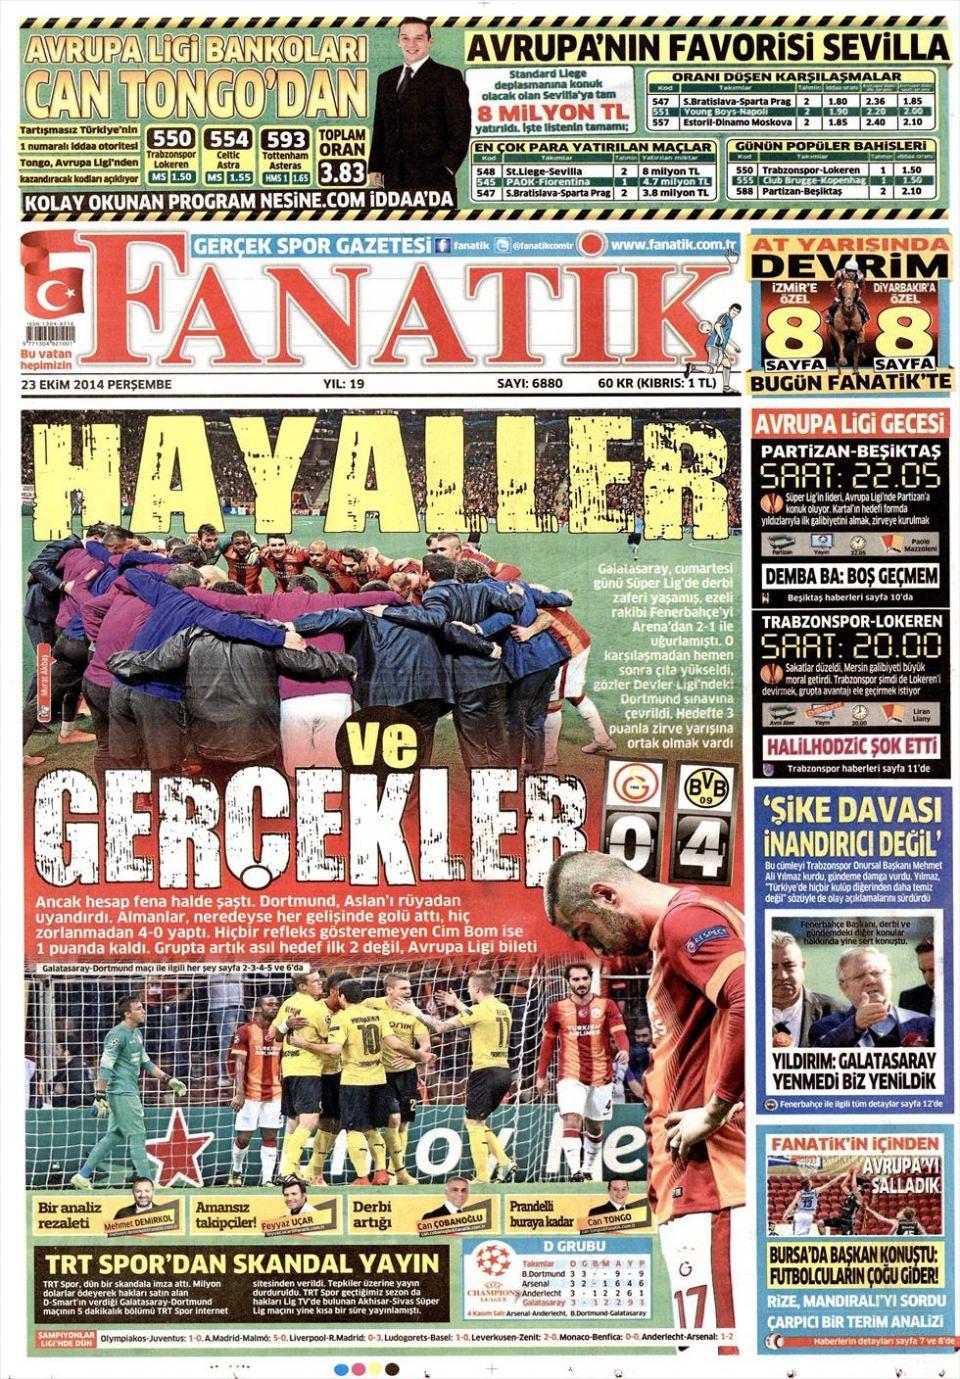 23 Ekim 2014 gazete manşetleri 6